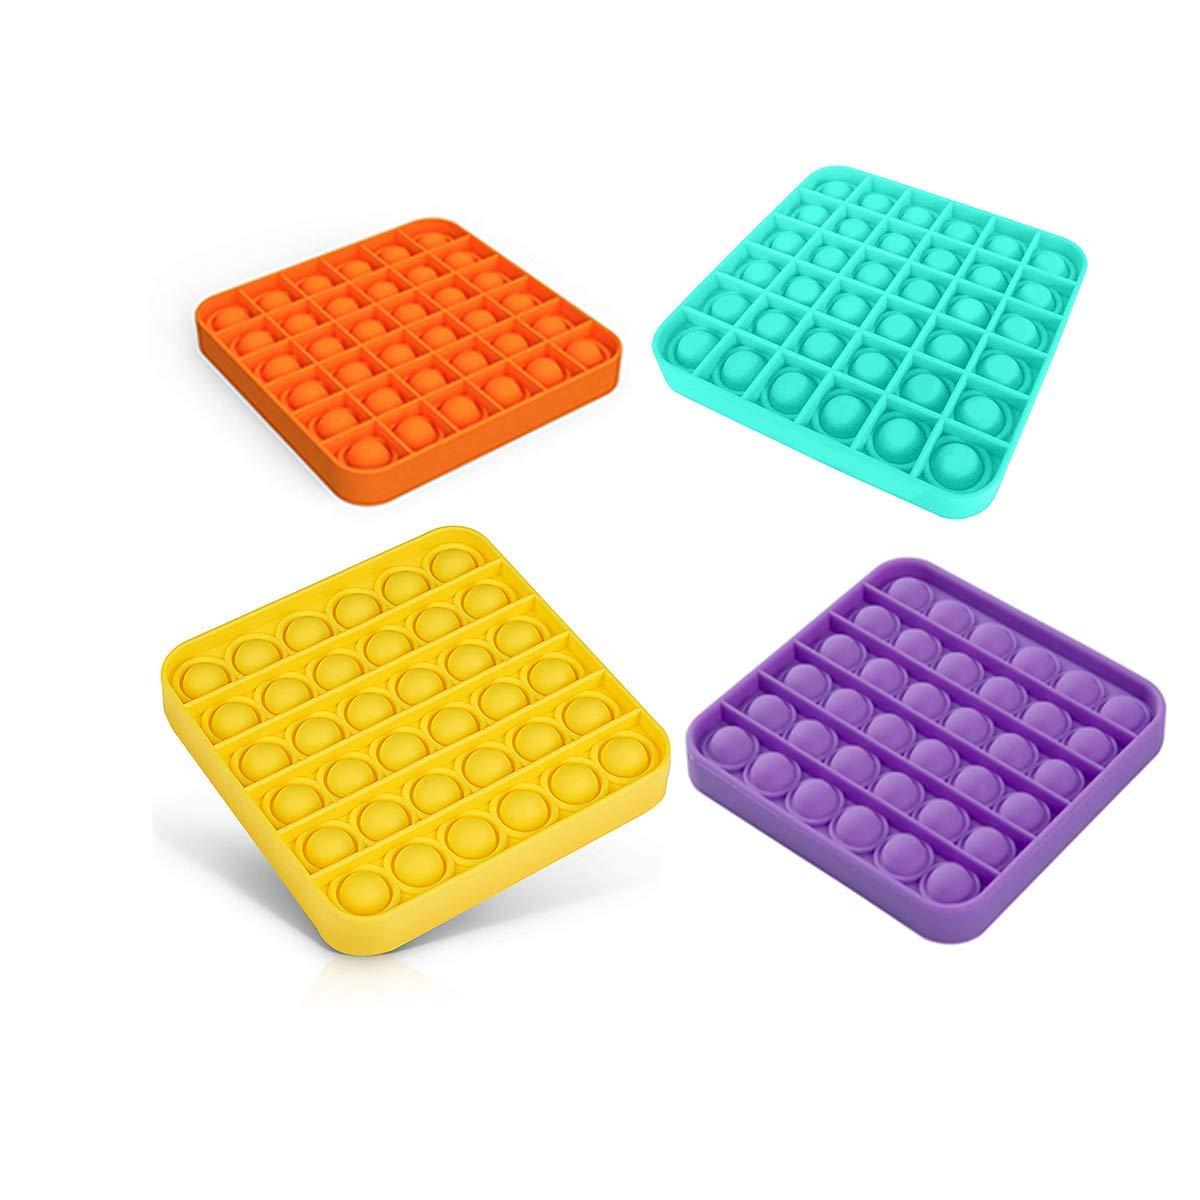 Xihe Fashion Pop Push it Fidget Toy pop Bubble Fidget Sensory Toys Stress Relief and Anti-Anxiety Tools for Kids Girls boys-Square-4PCS-